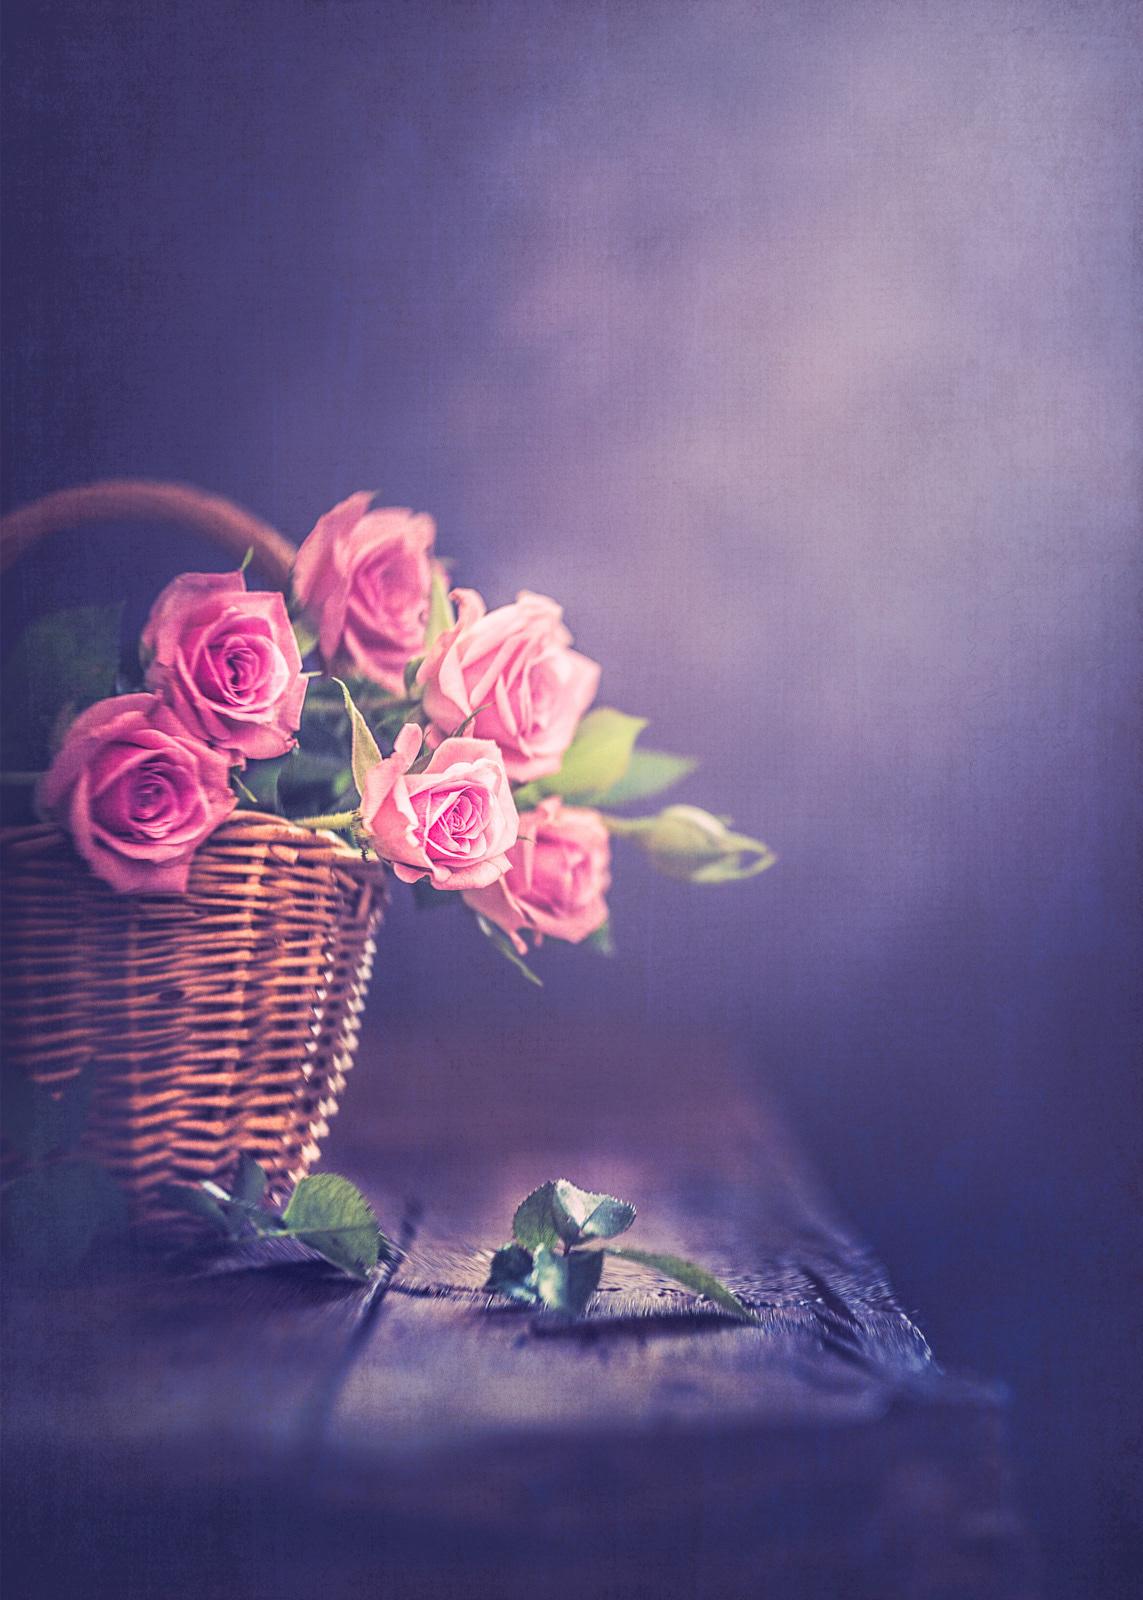 Pink roses / фотограф Rosana Zanetti Fait